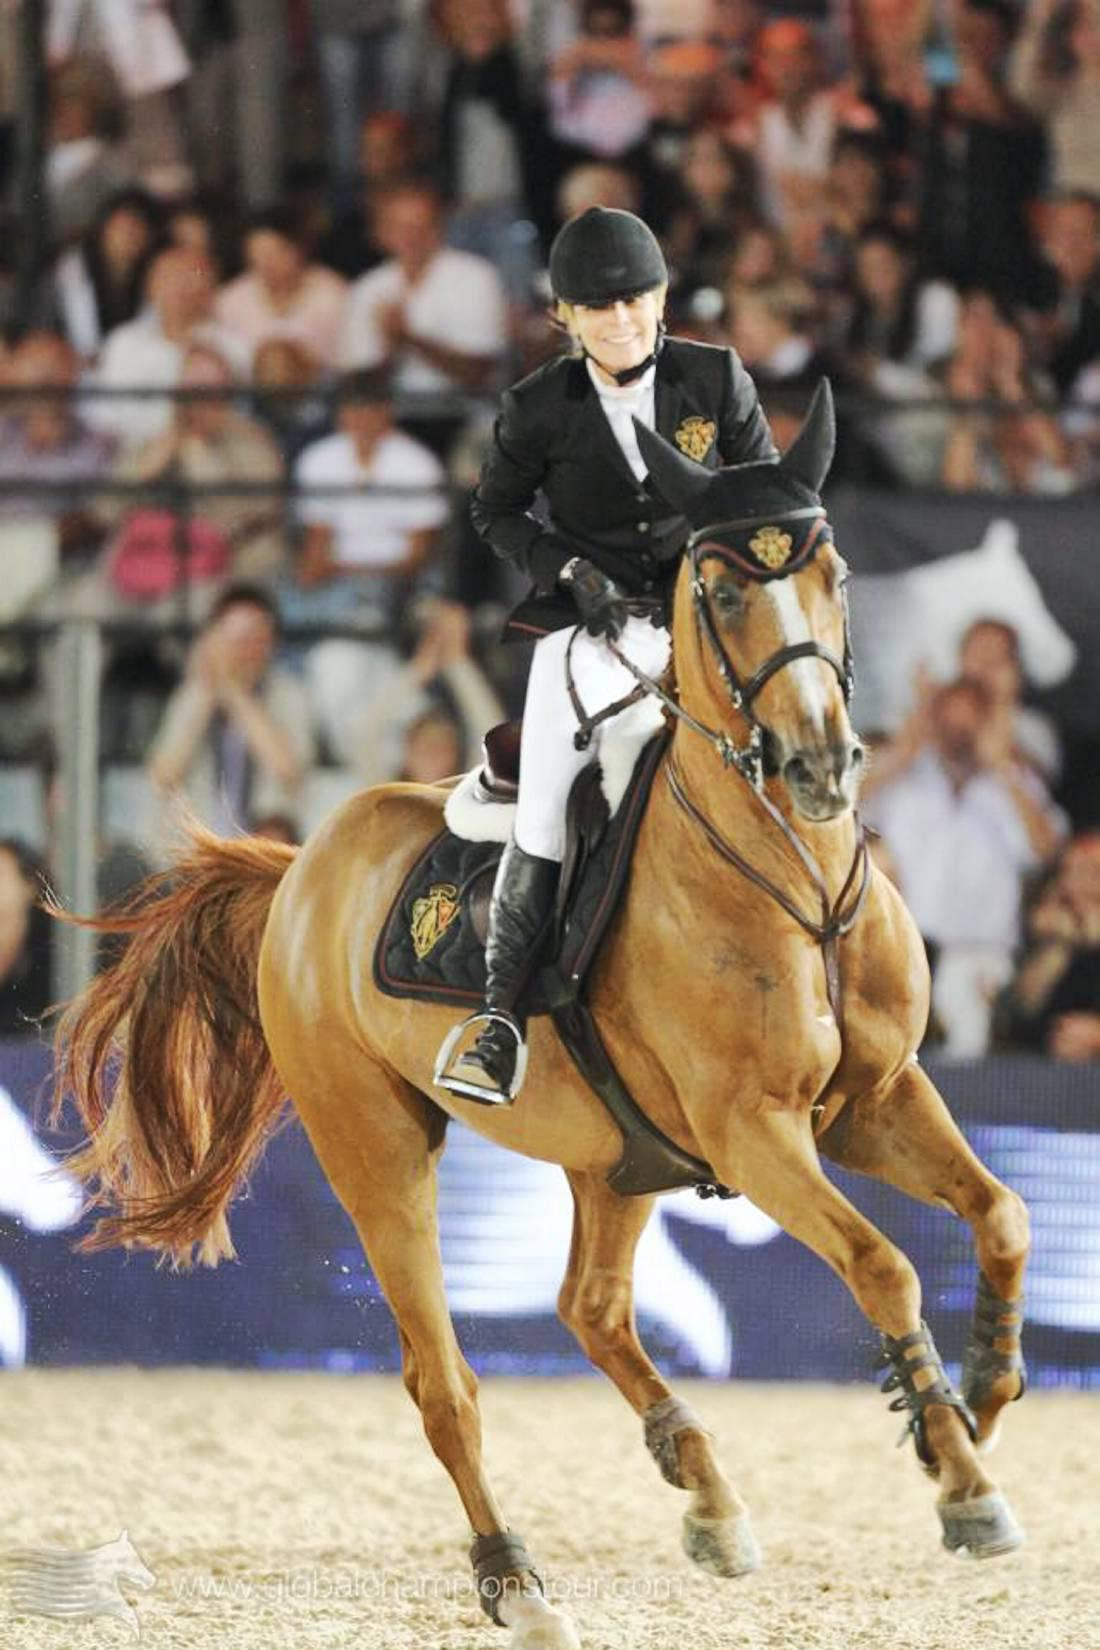 Edwina on top form in Doha win